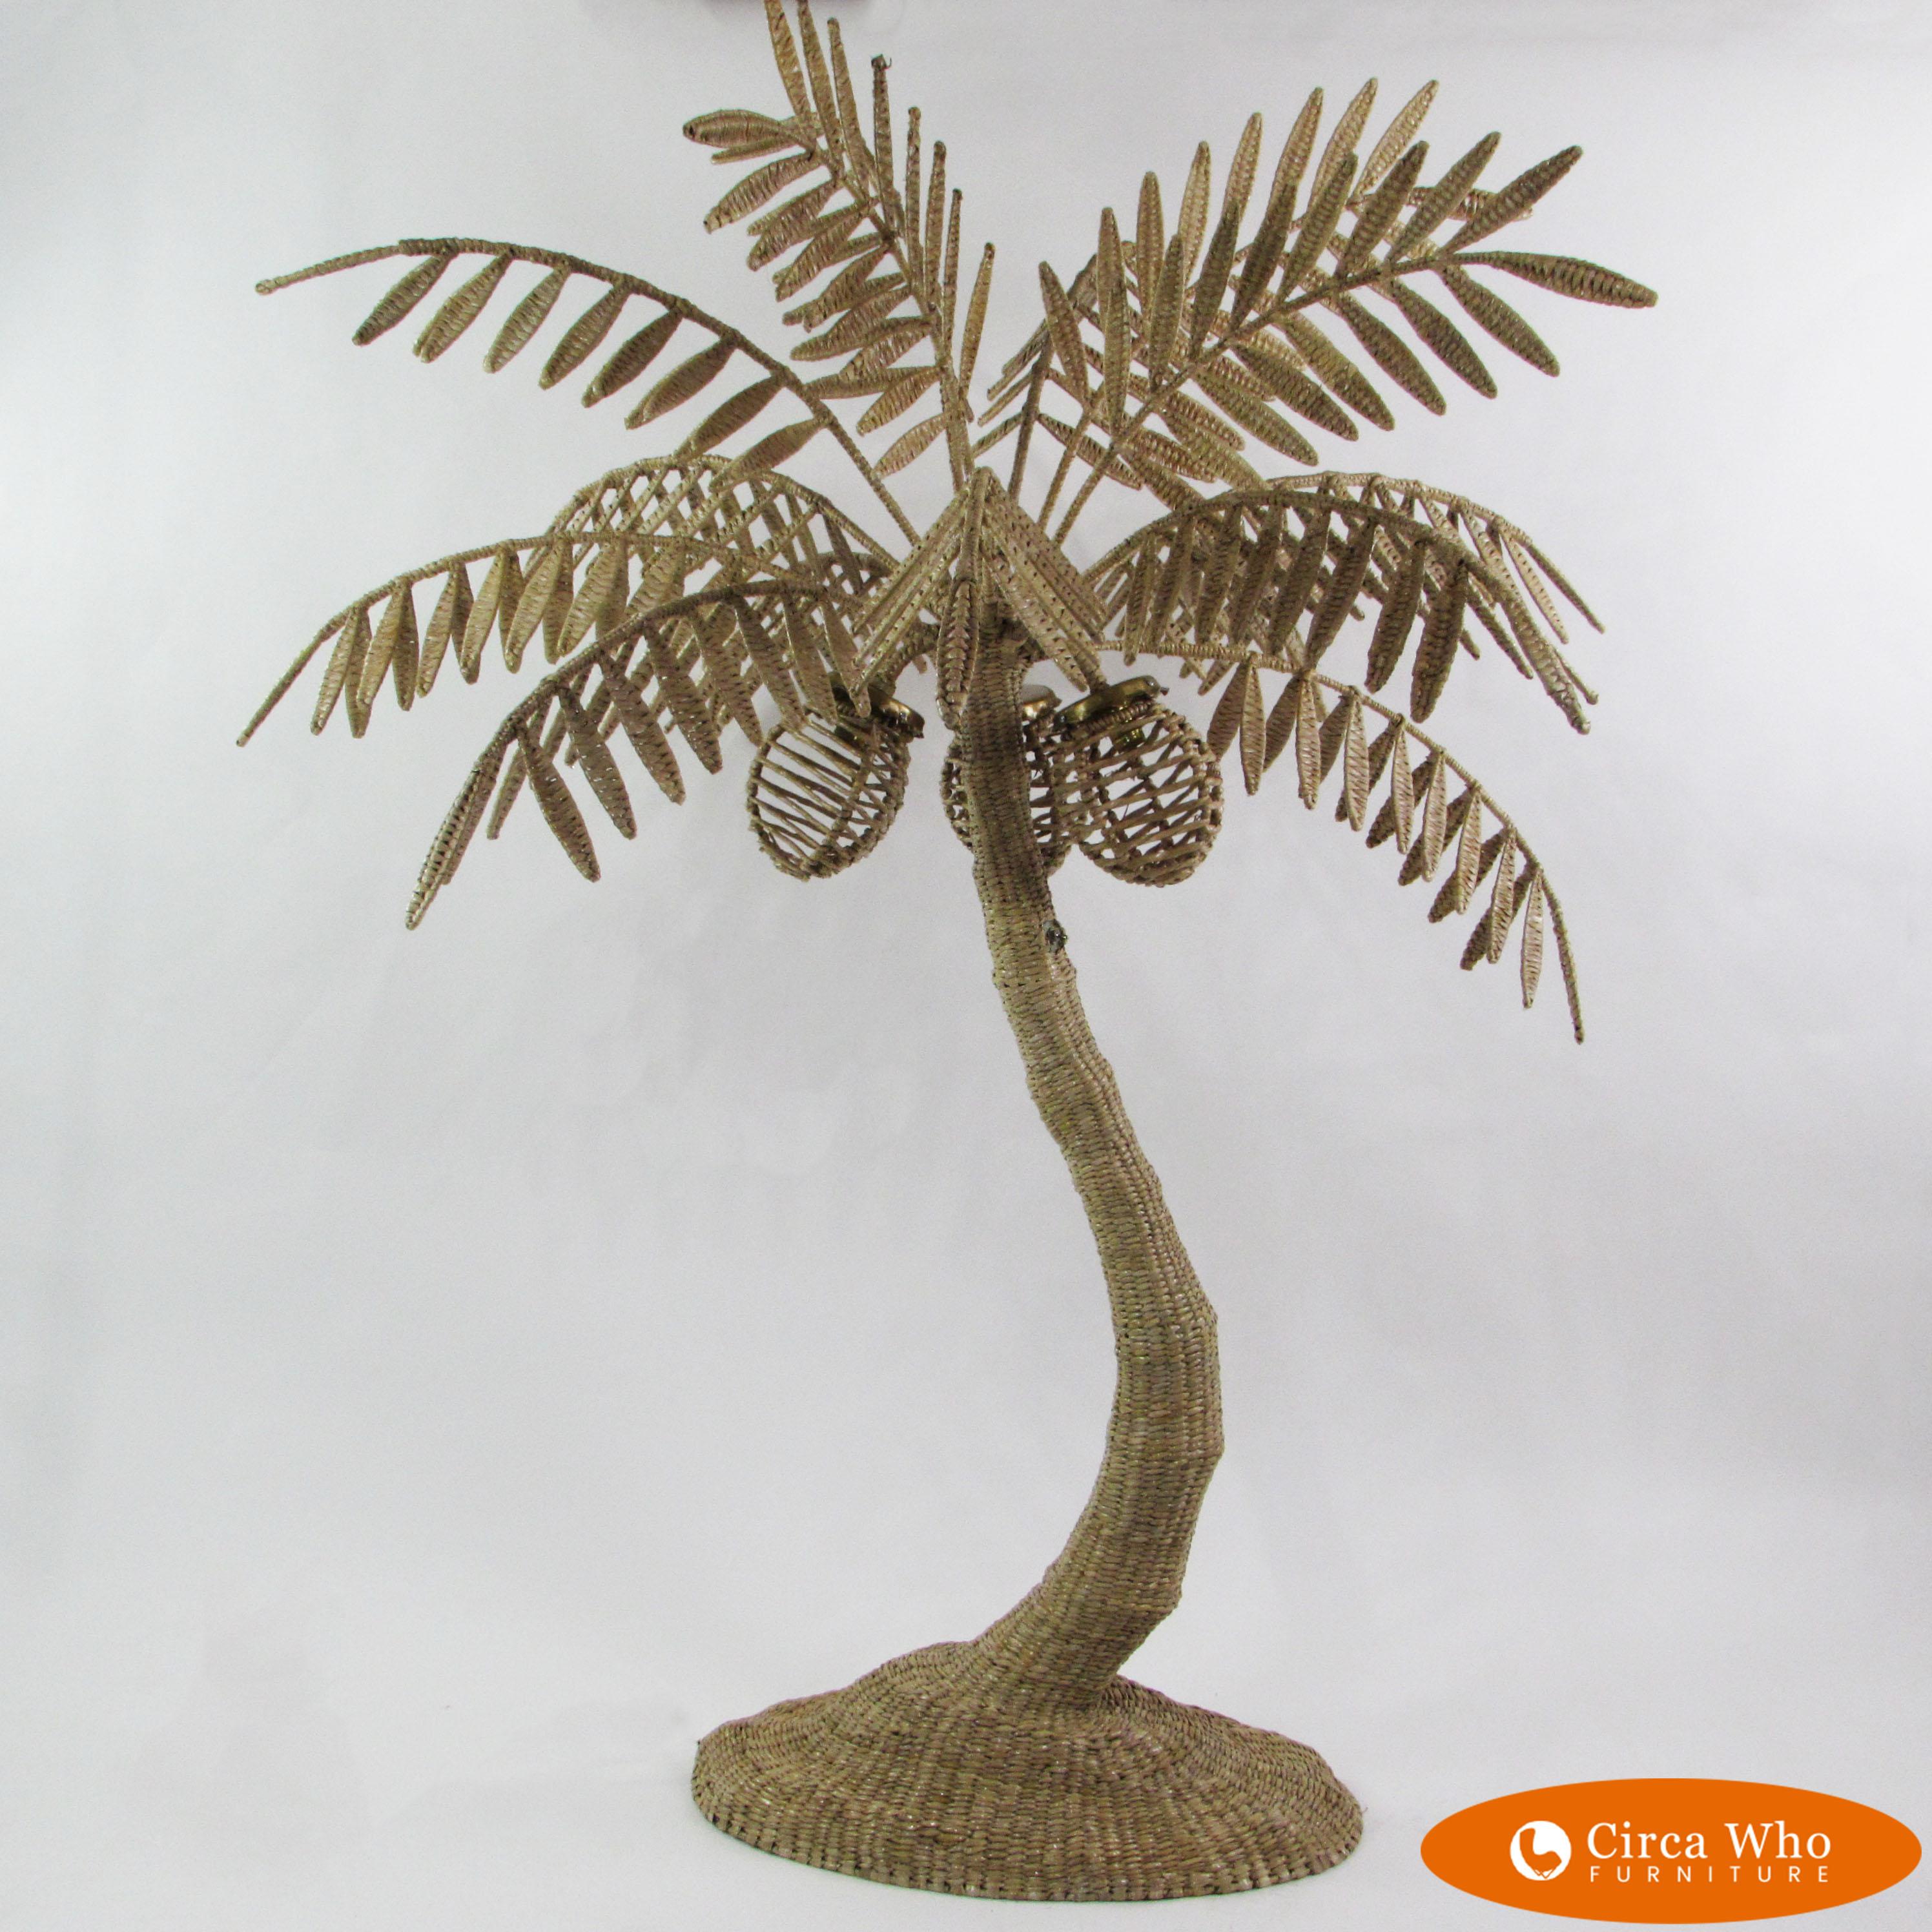 0647f6e703155 Woven Rattan Palm Tree Floor Lamp by Mario Lopez Torres – Circa Who